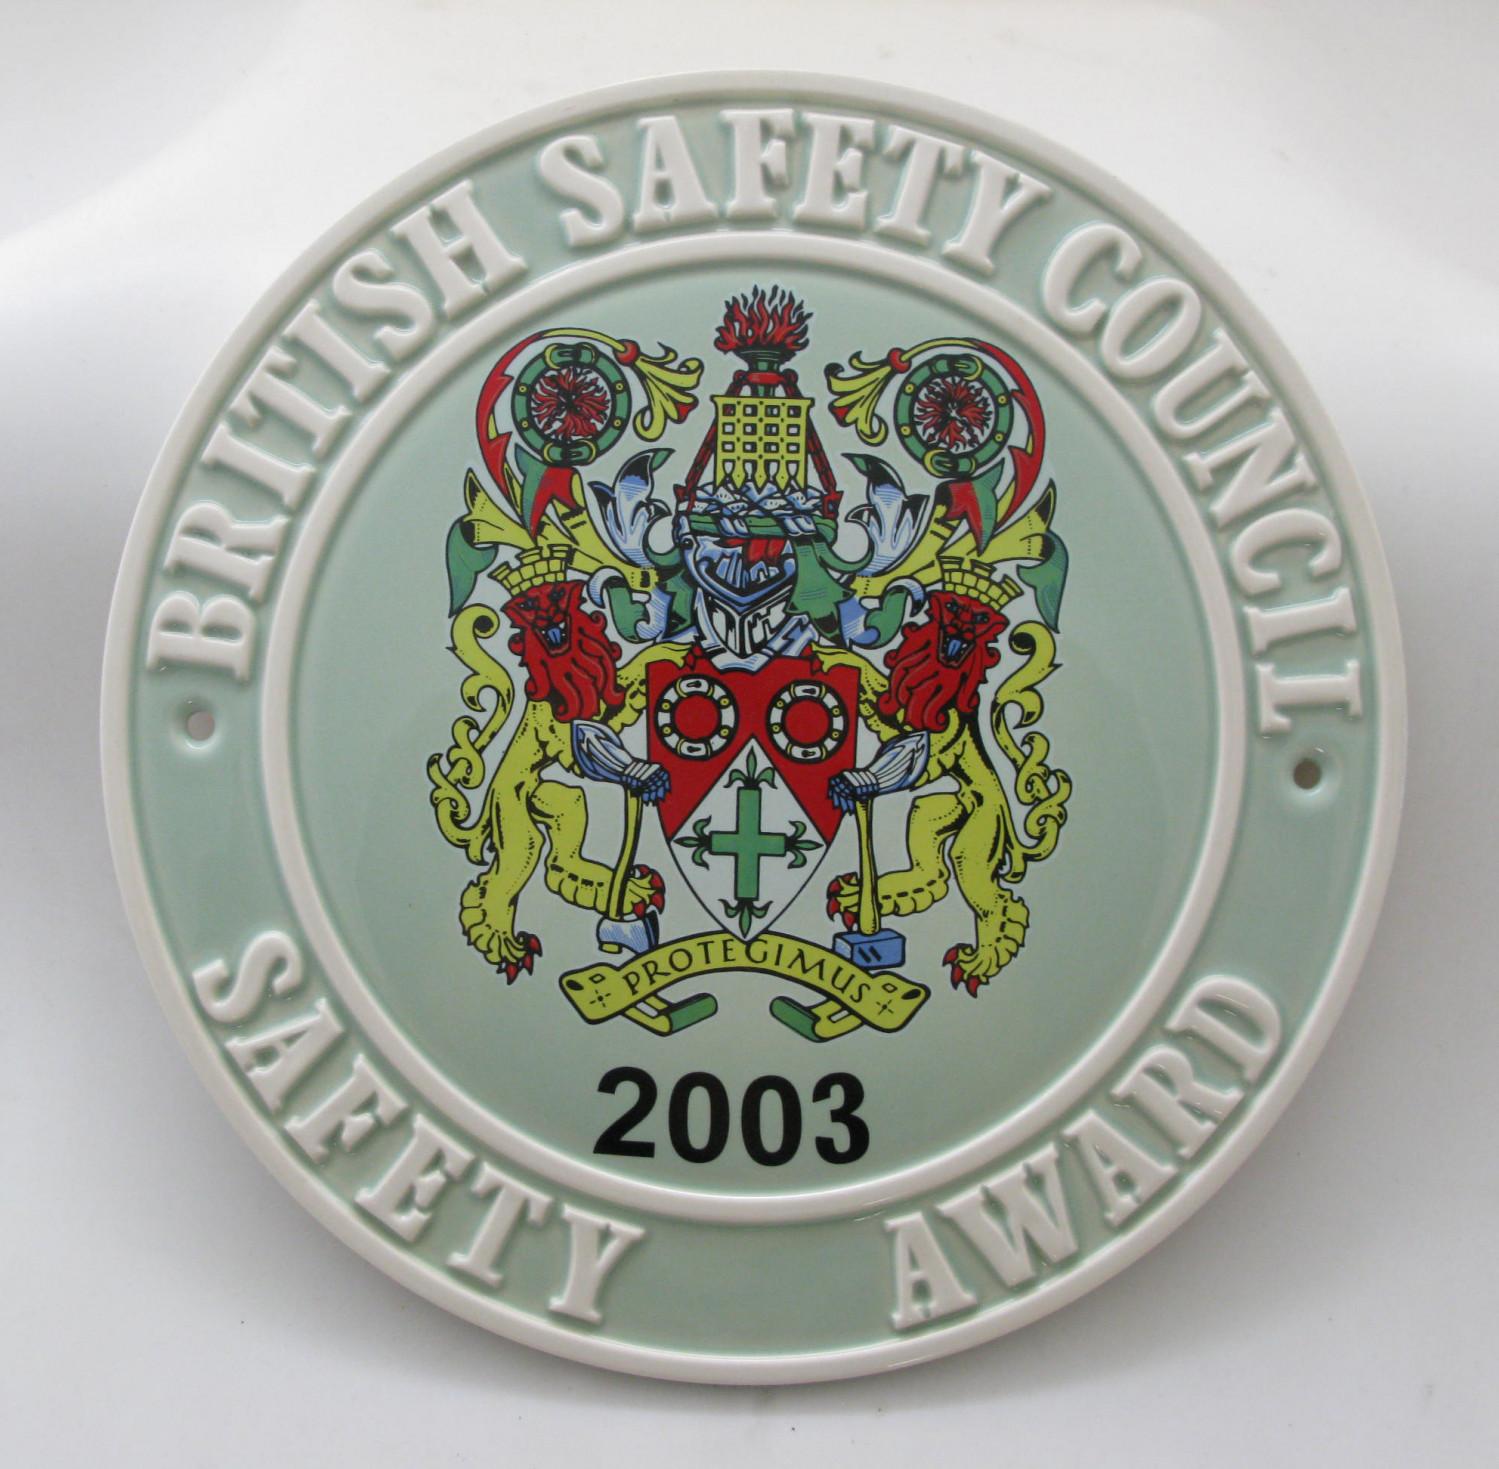 2003 Safety Award Plaque